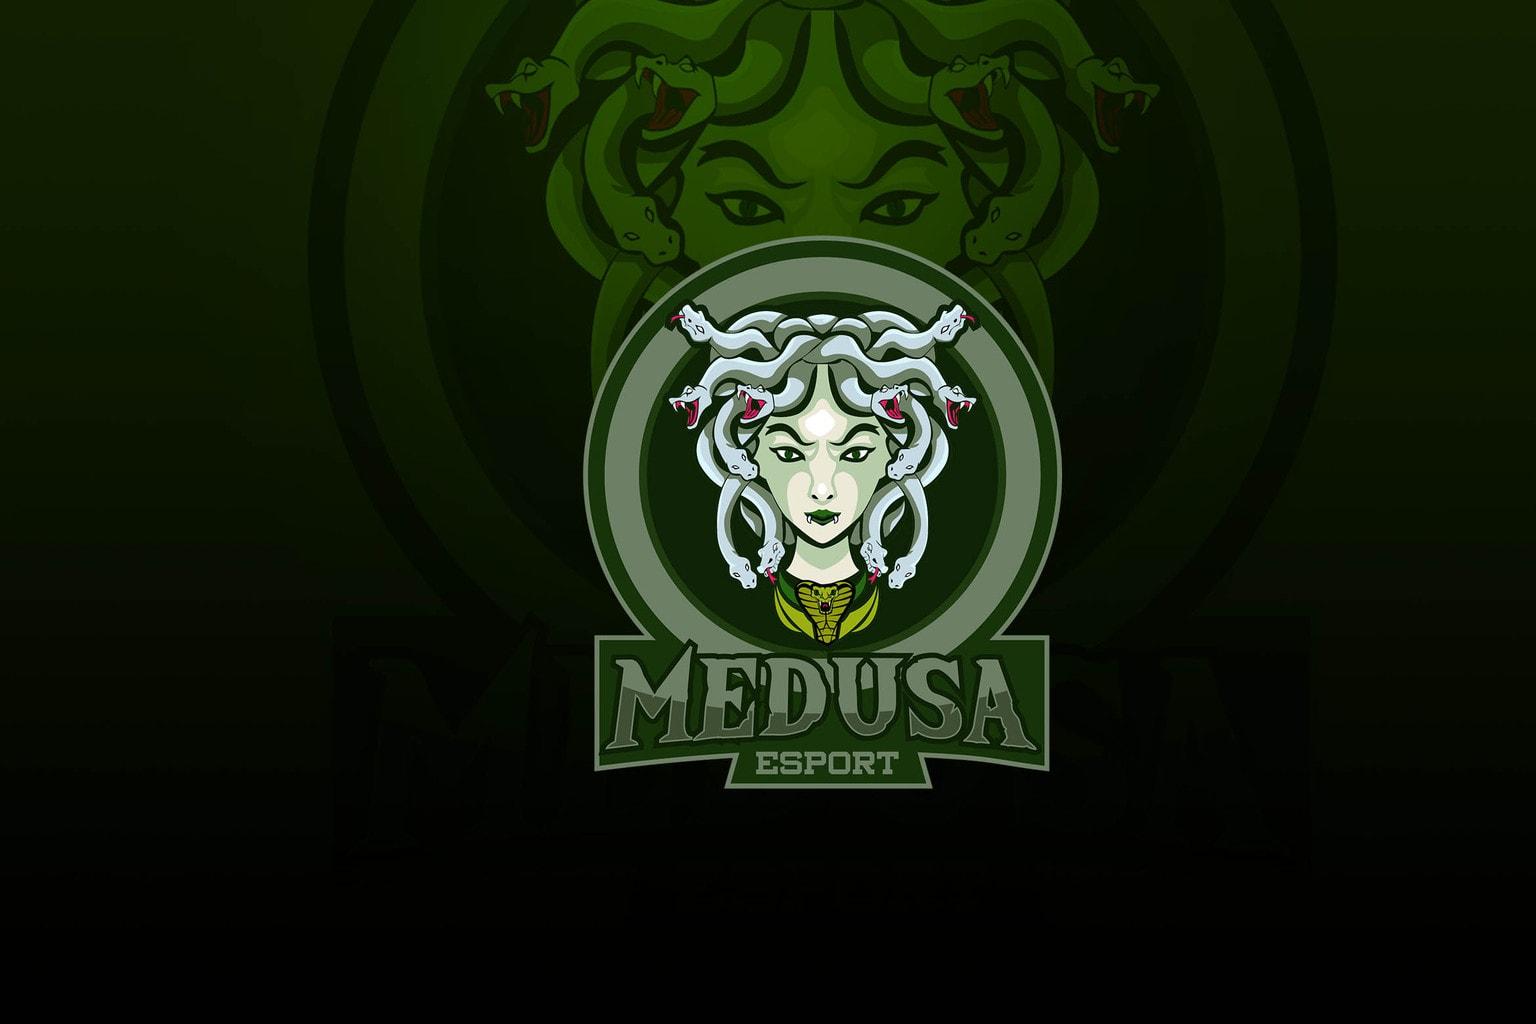 esport logo queen of medusa